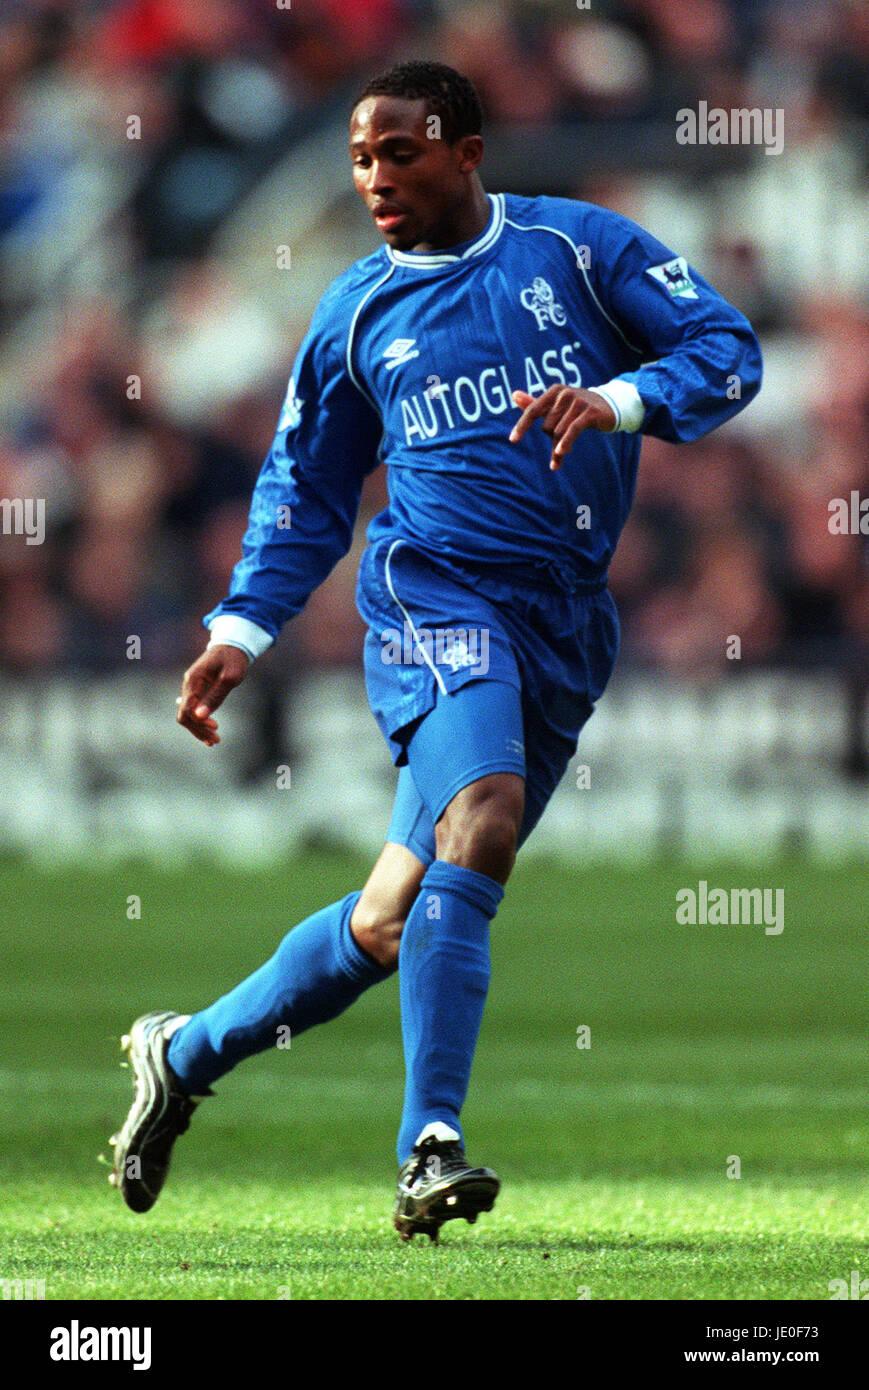 CELESTINE BABAYARO CHELSEA FC 04 March 2000 - Stock Image